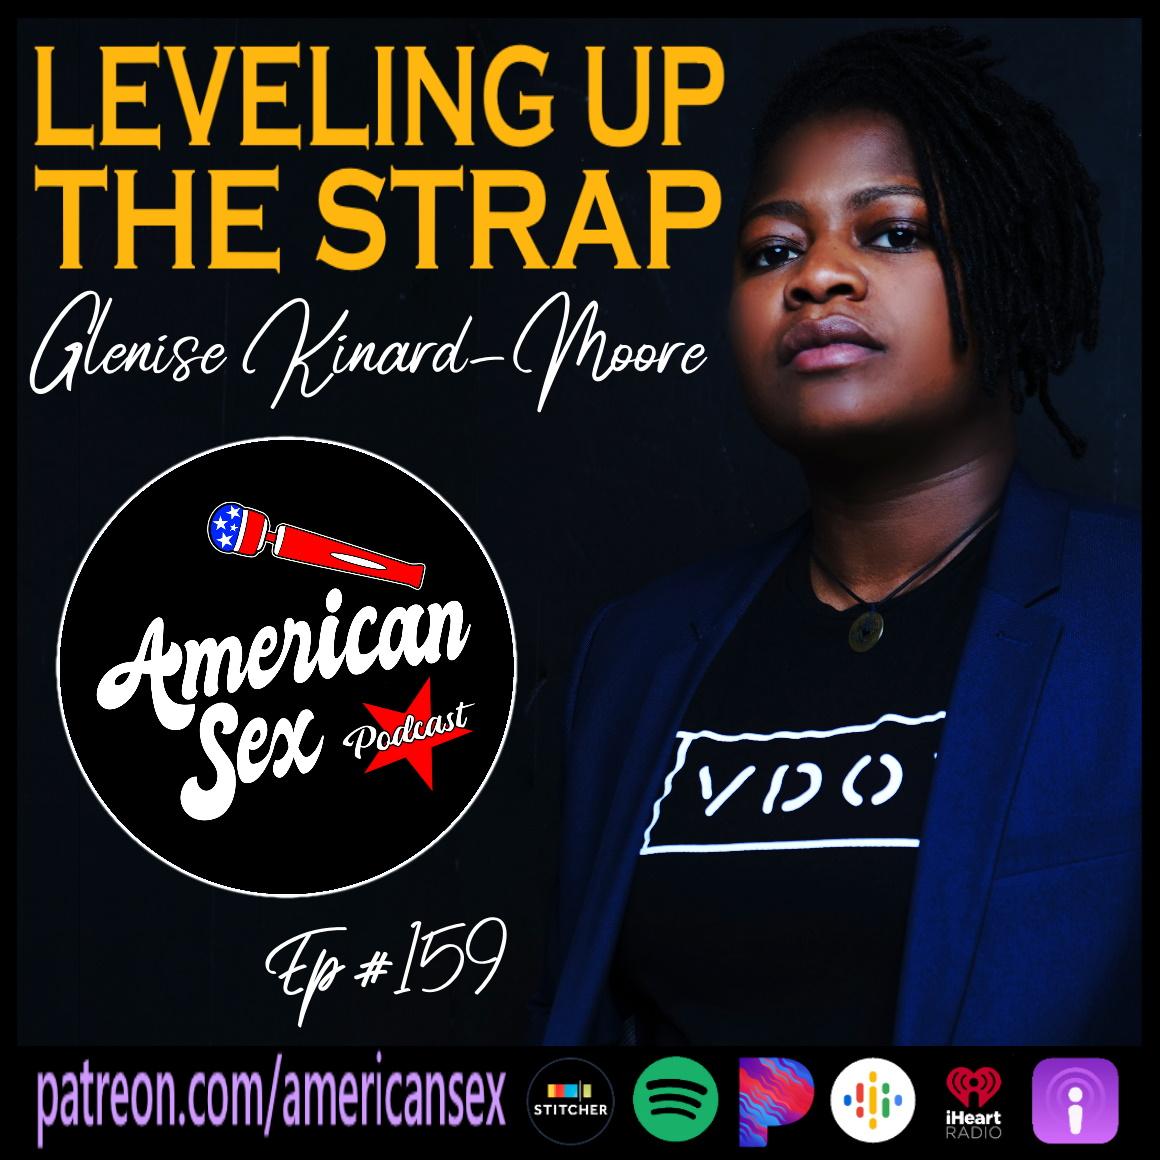 Glenis Kinard Moore VDOM Leveling Up The Strap American Sex Podcast episode art